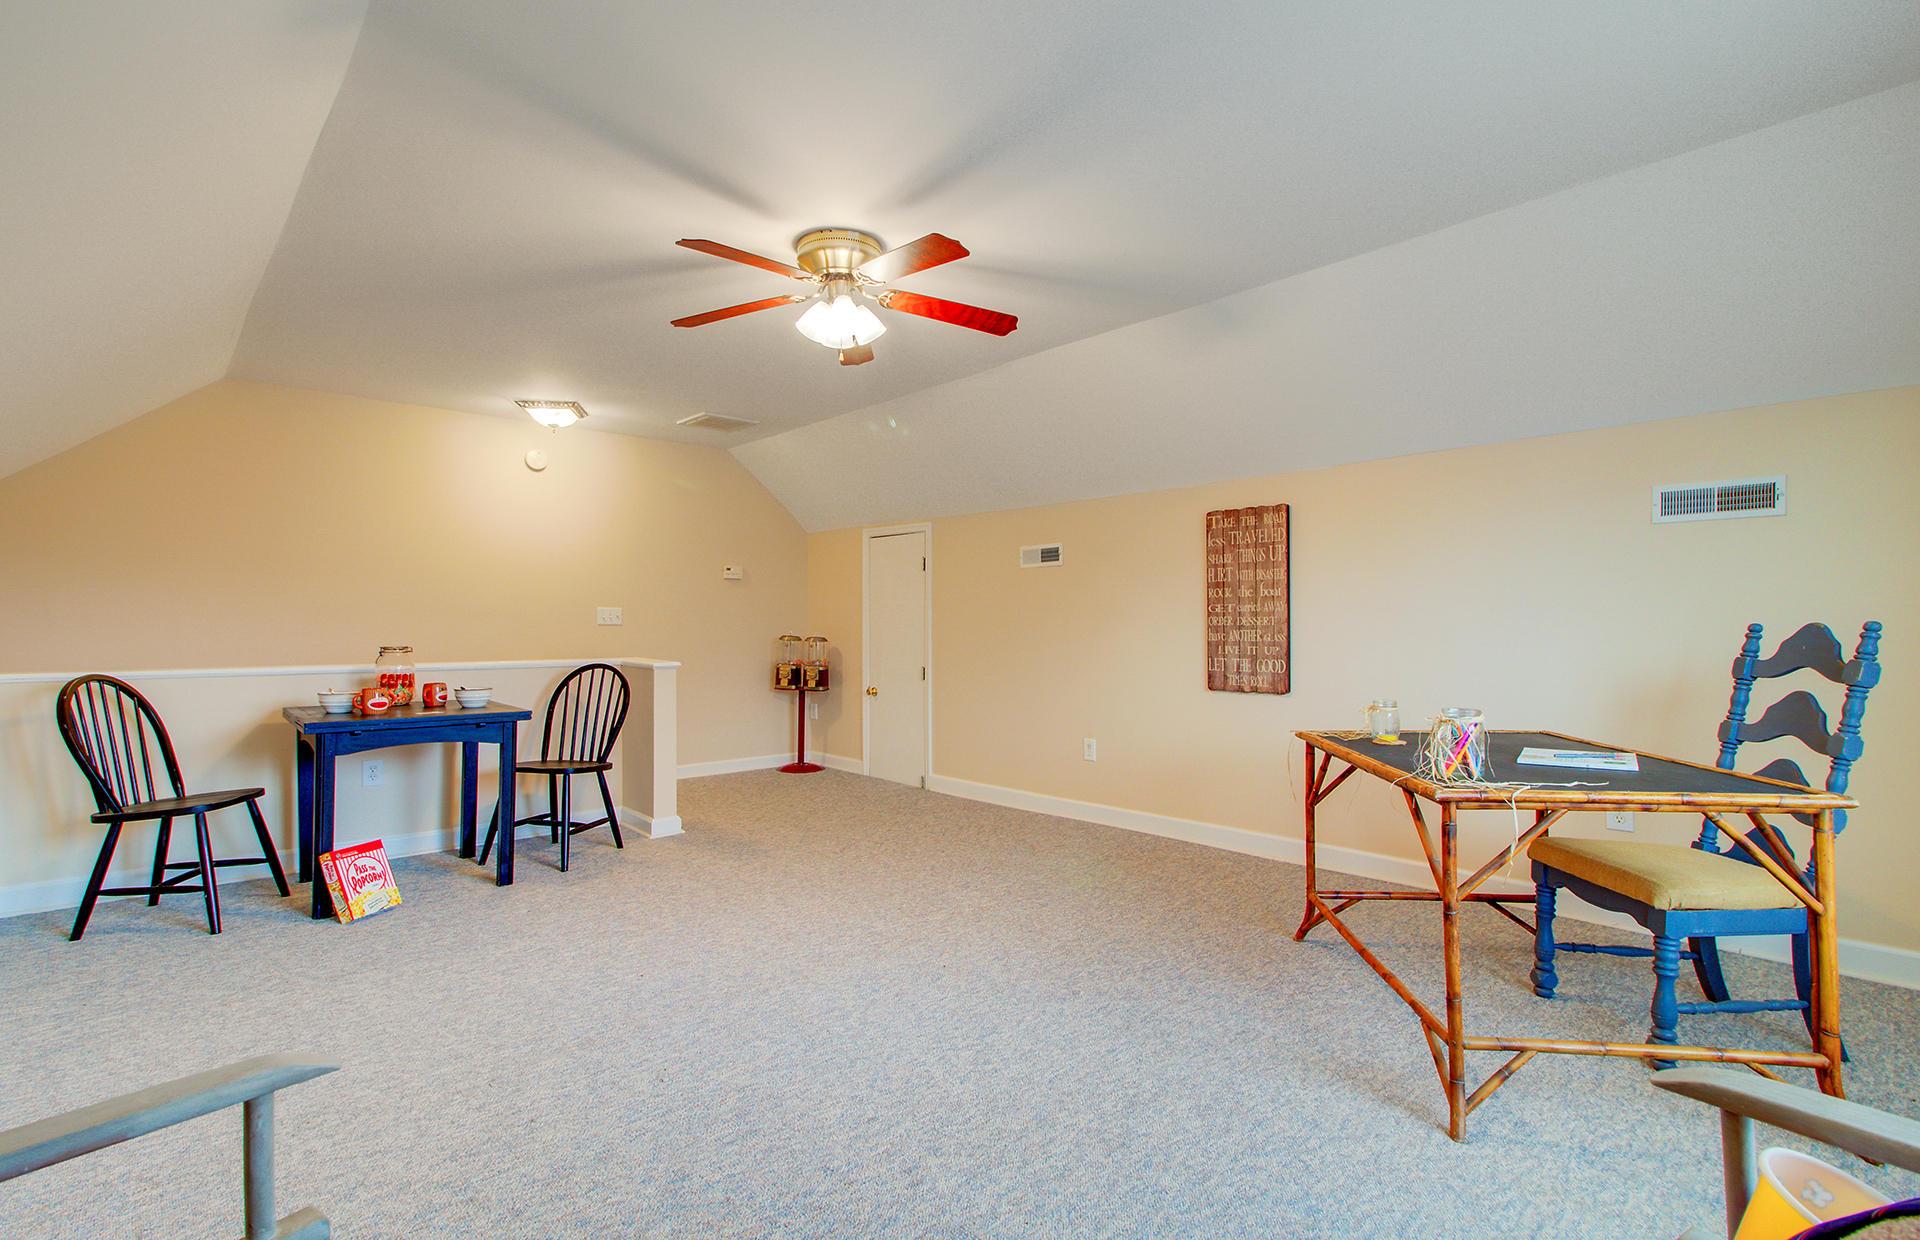 Bakers Landing Homes For Sale - 105 River Oak, North Charleston, SC - 17